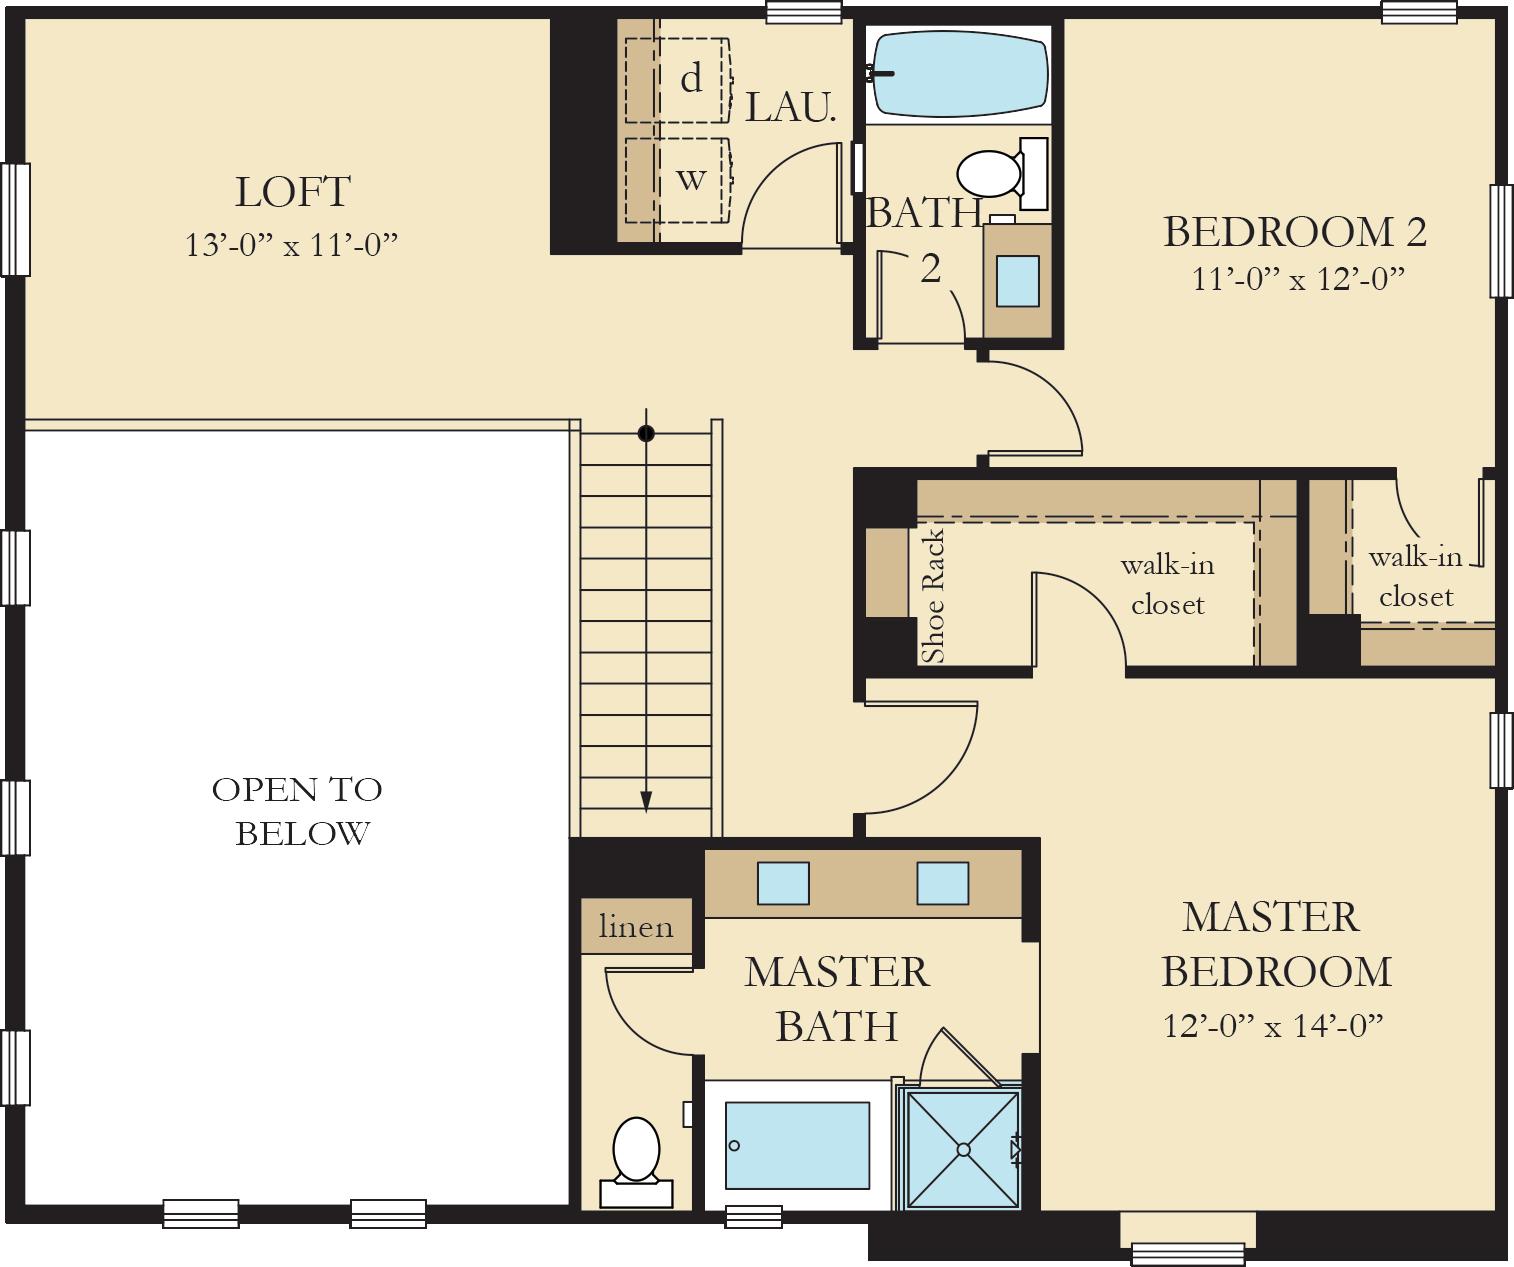 Vinelands | Residence 2 Second Floor